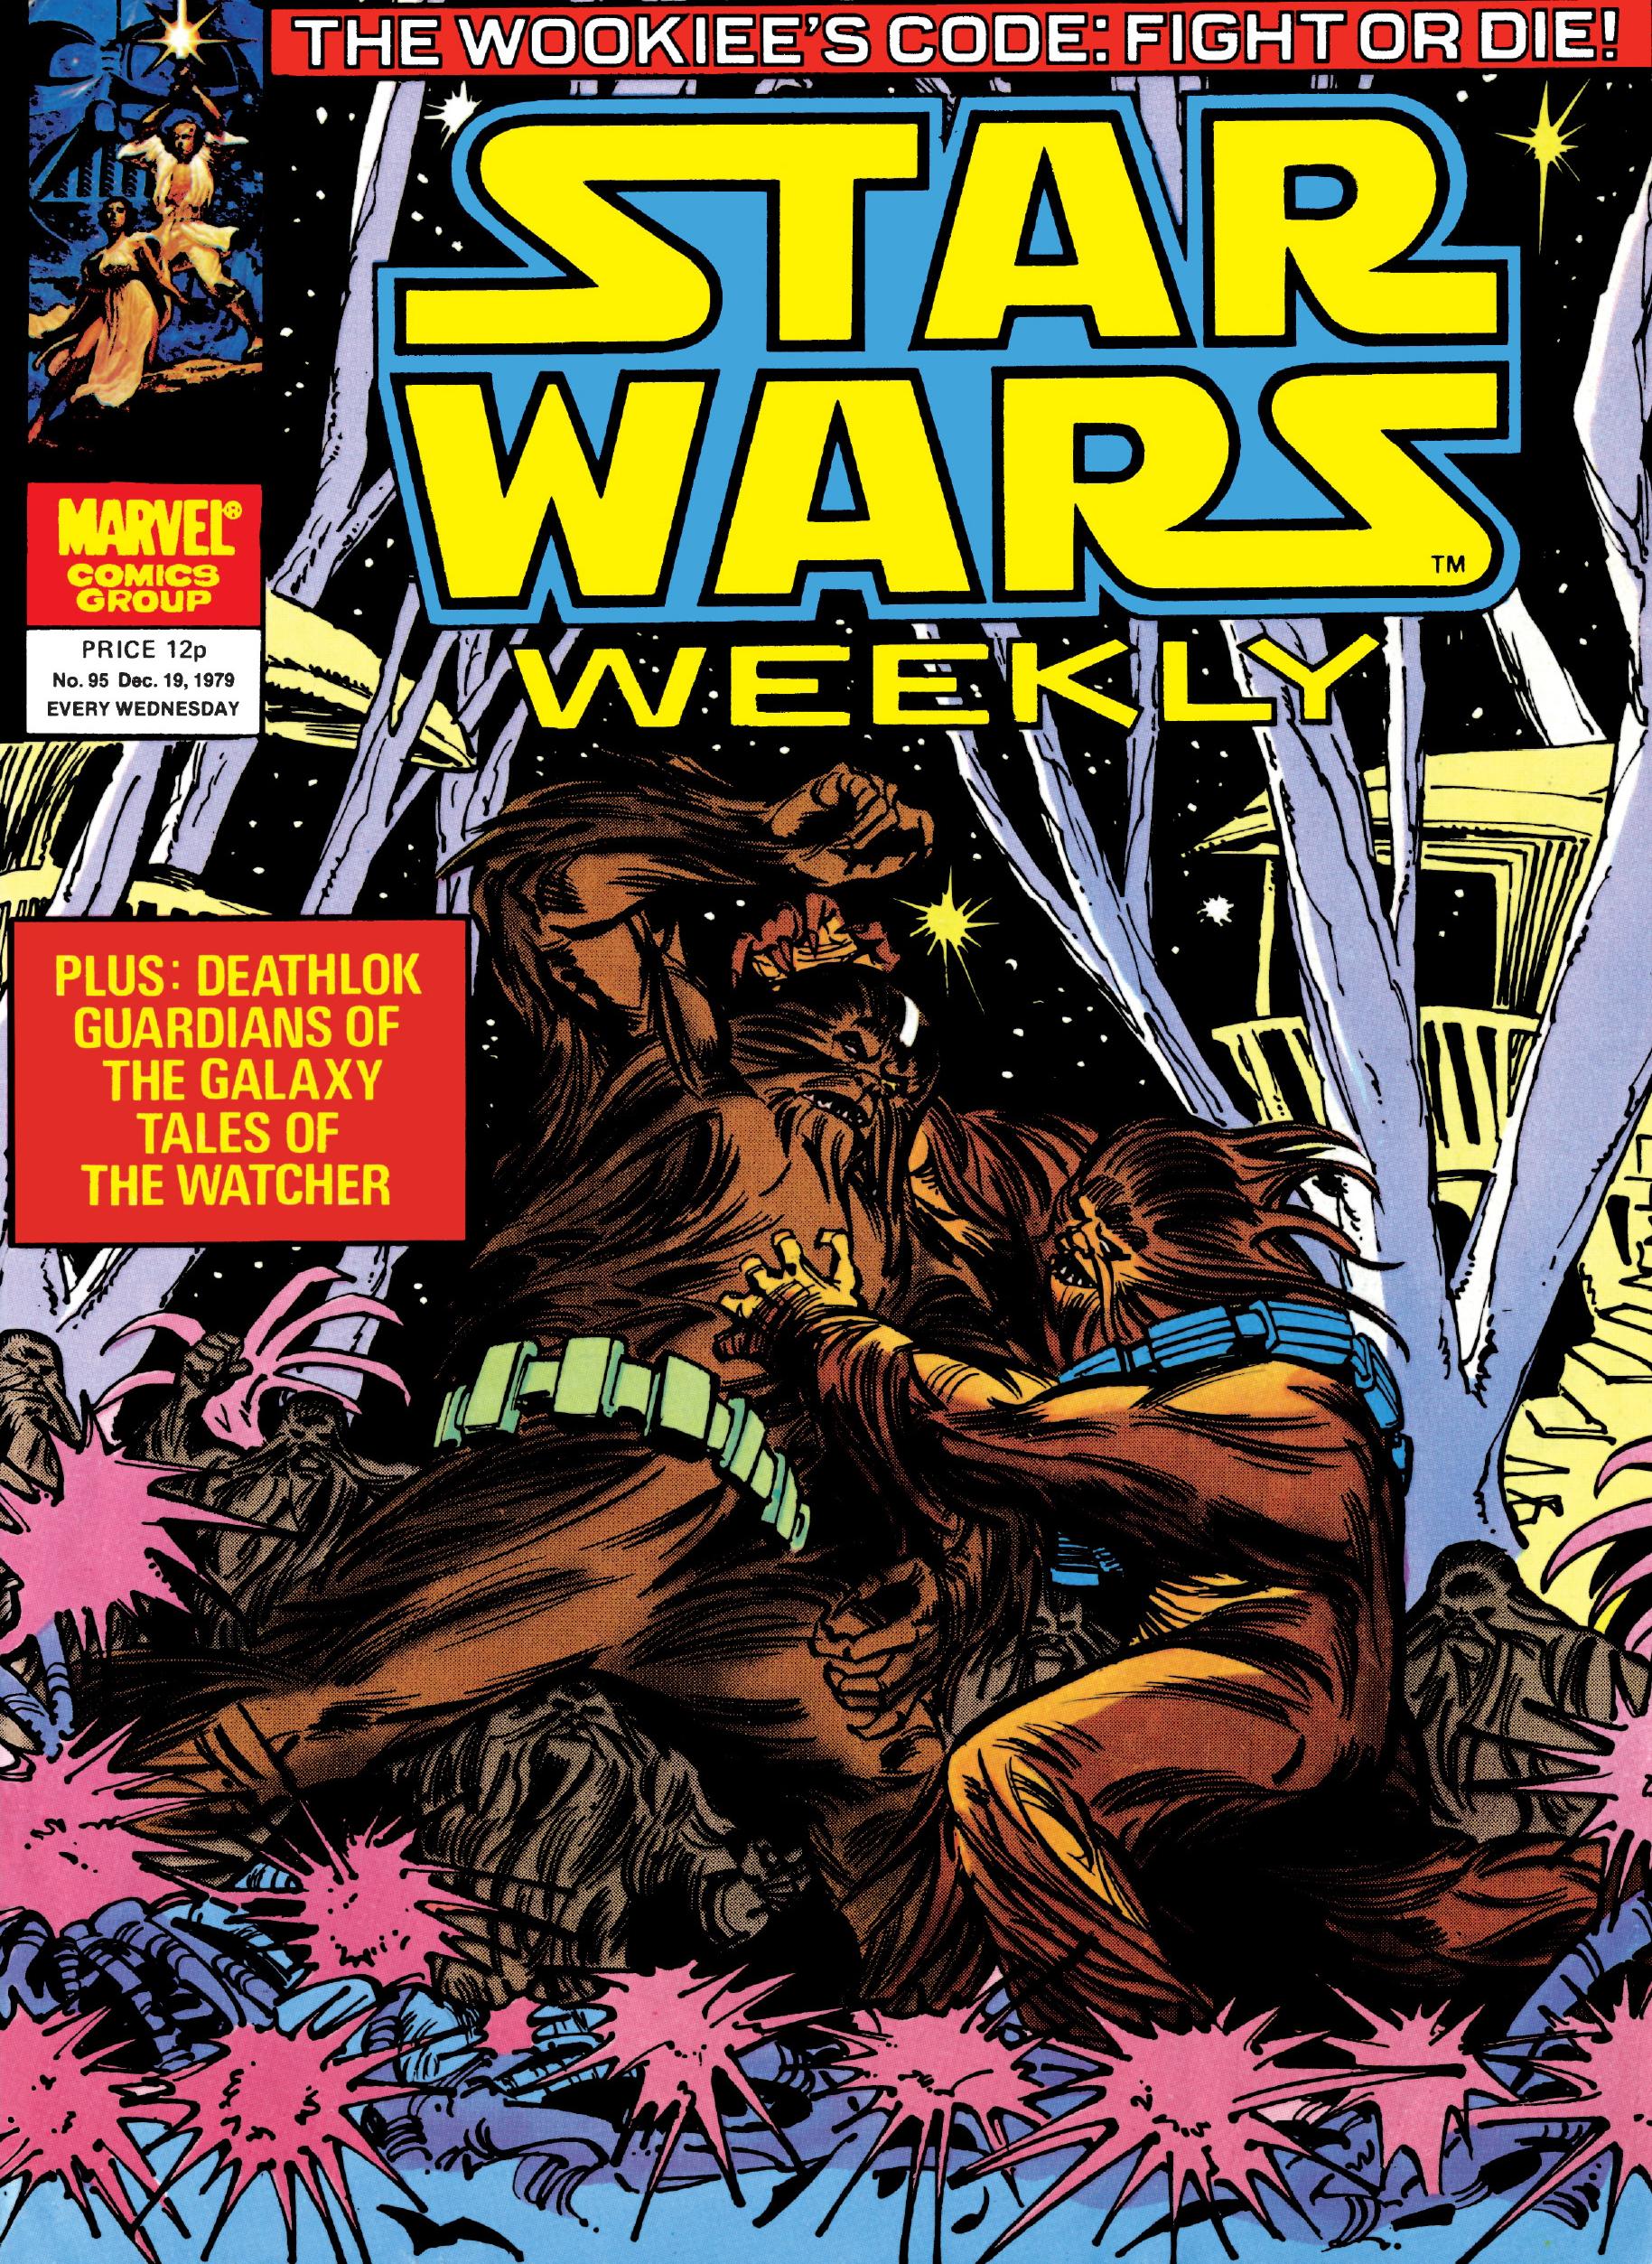 Star Wars Weekly 95